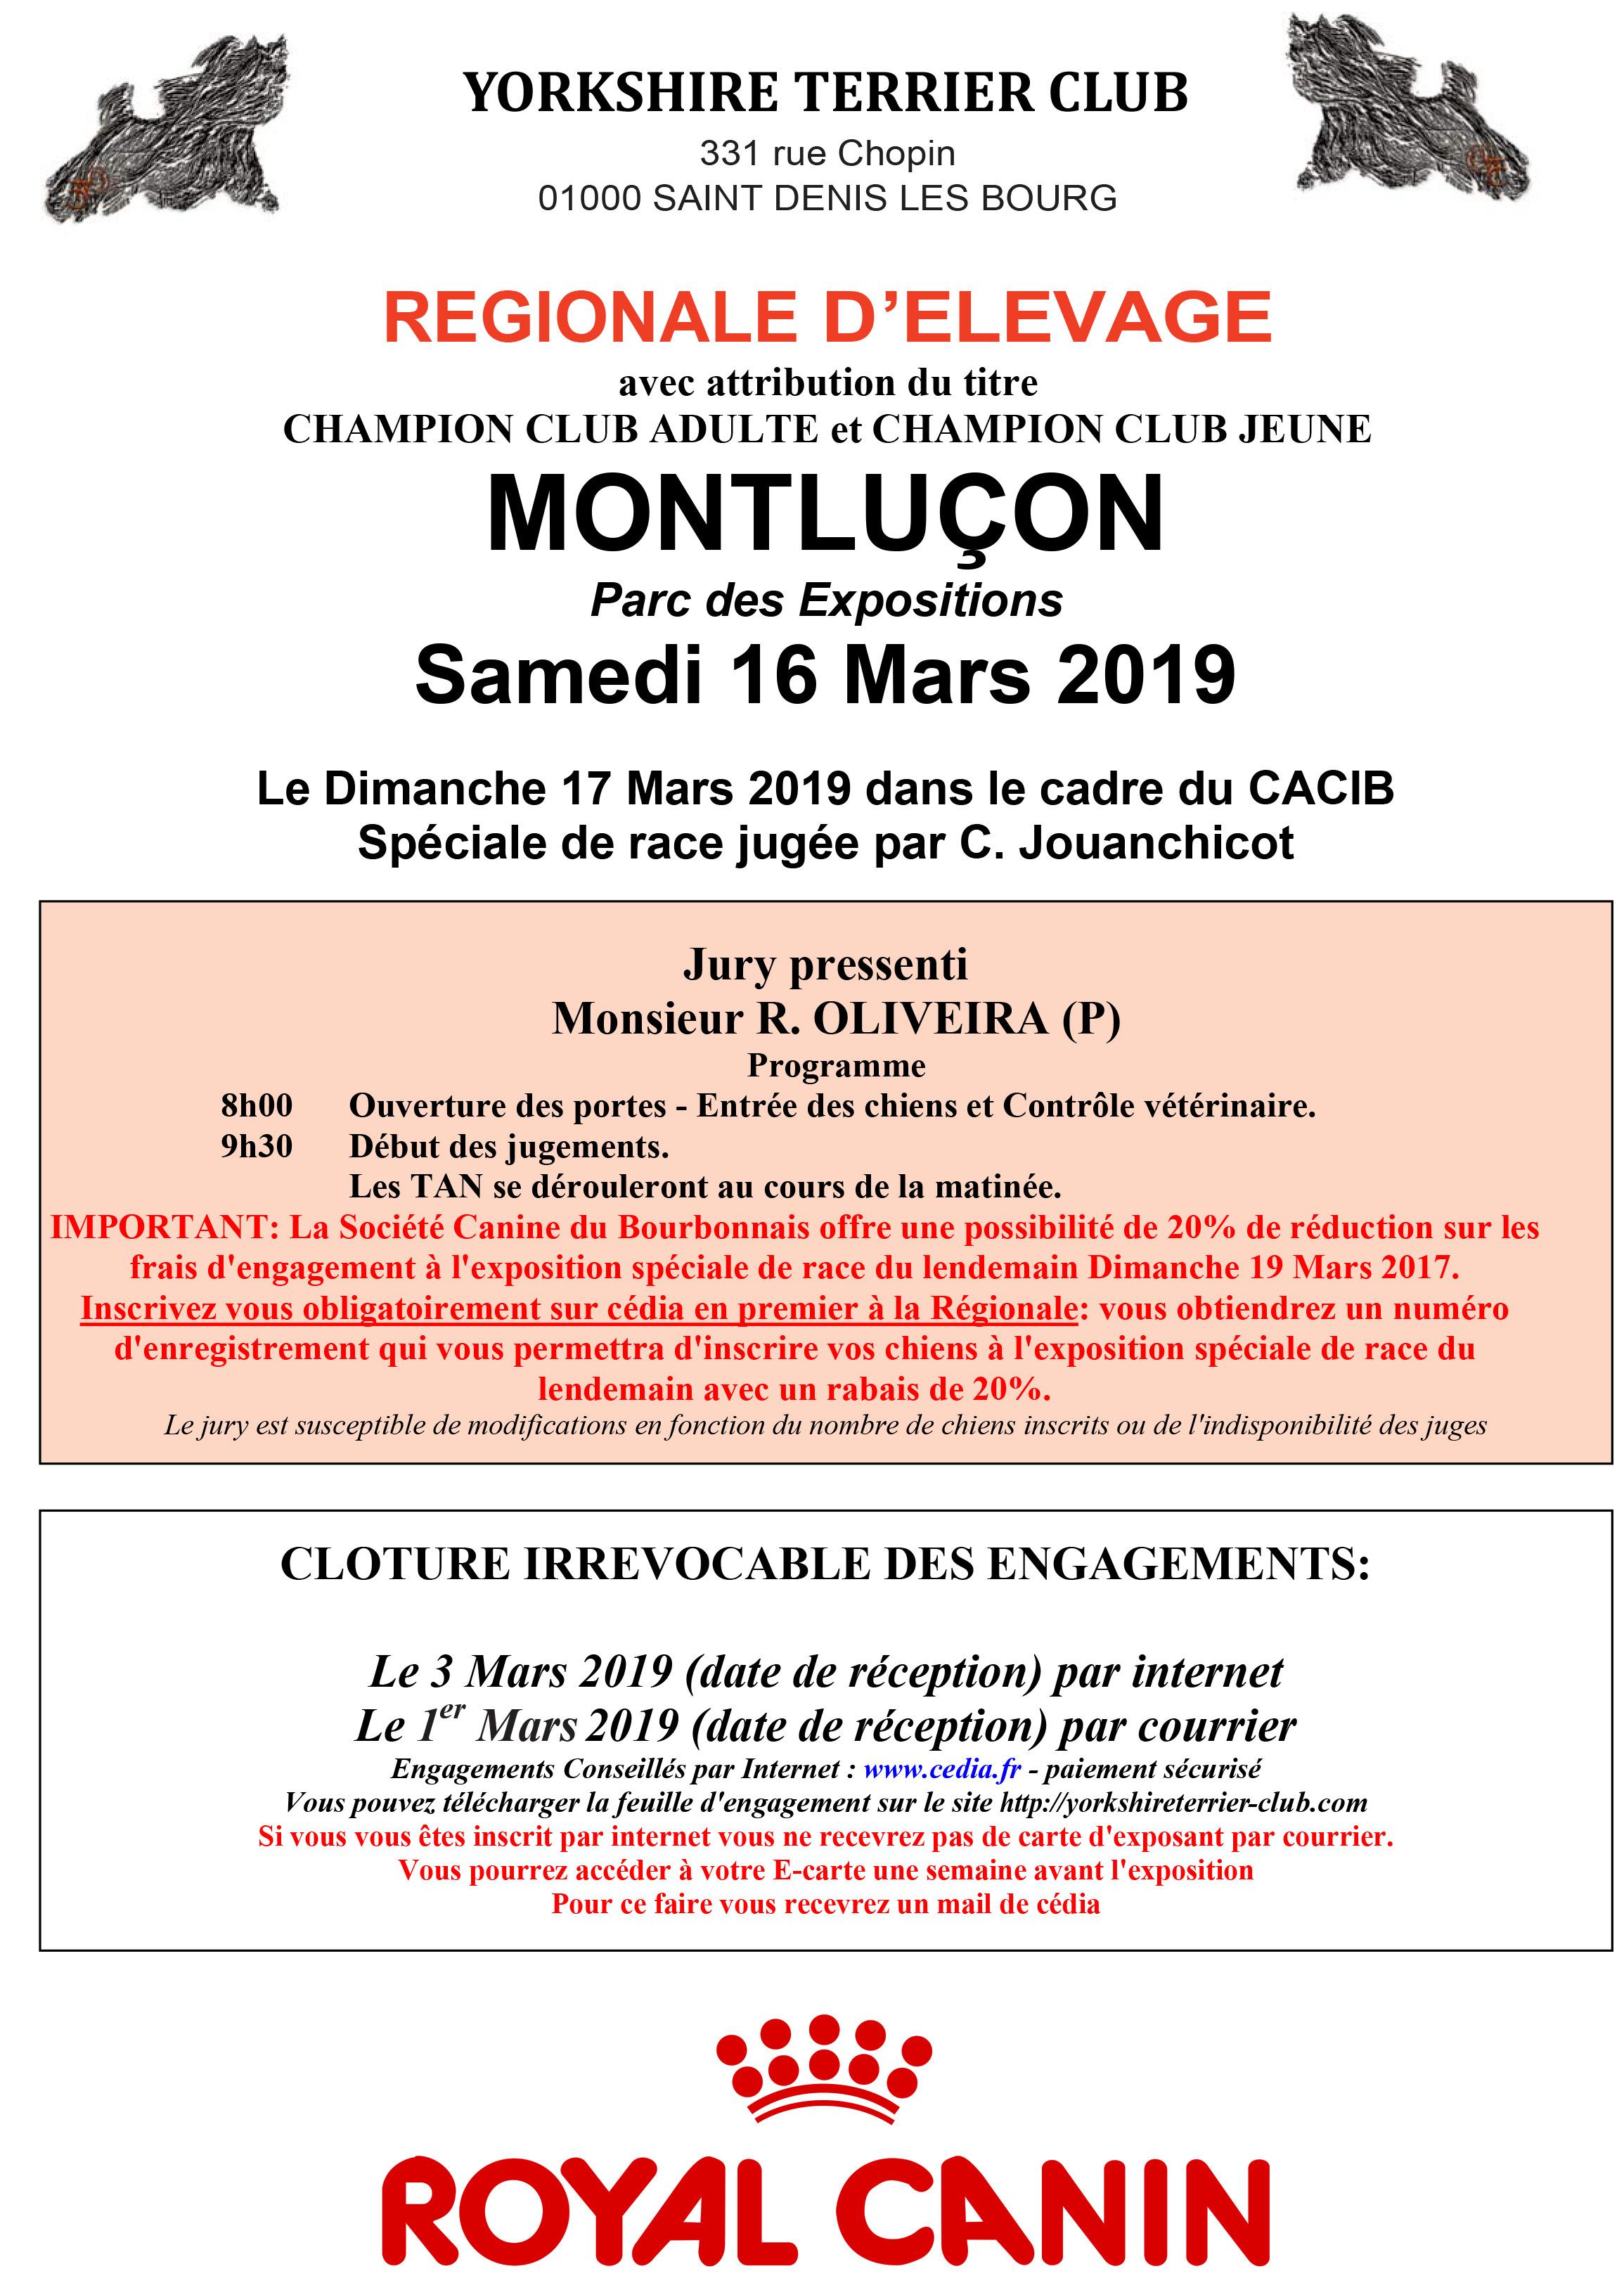 Microsoft Word - feuille regionale elevage 2019 montlucon.doc